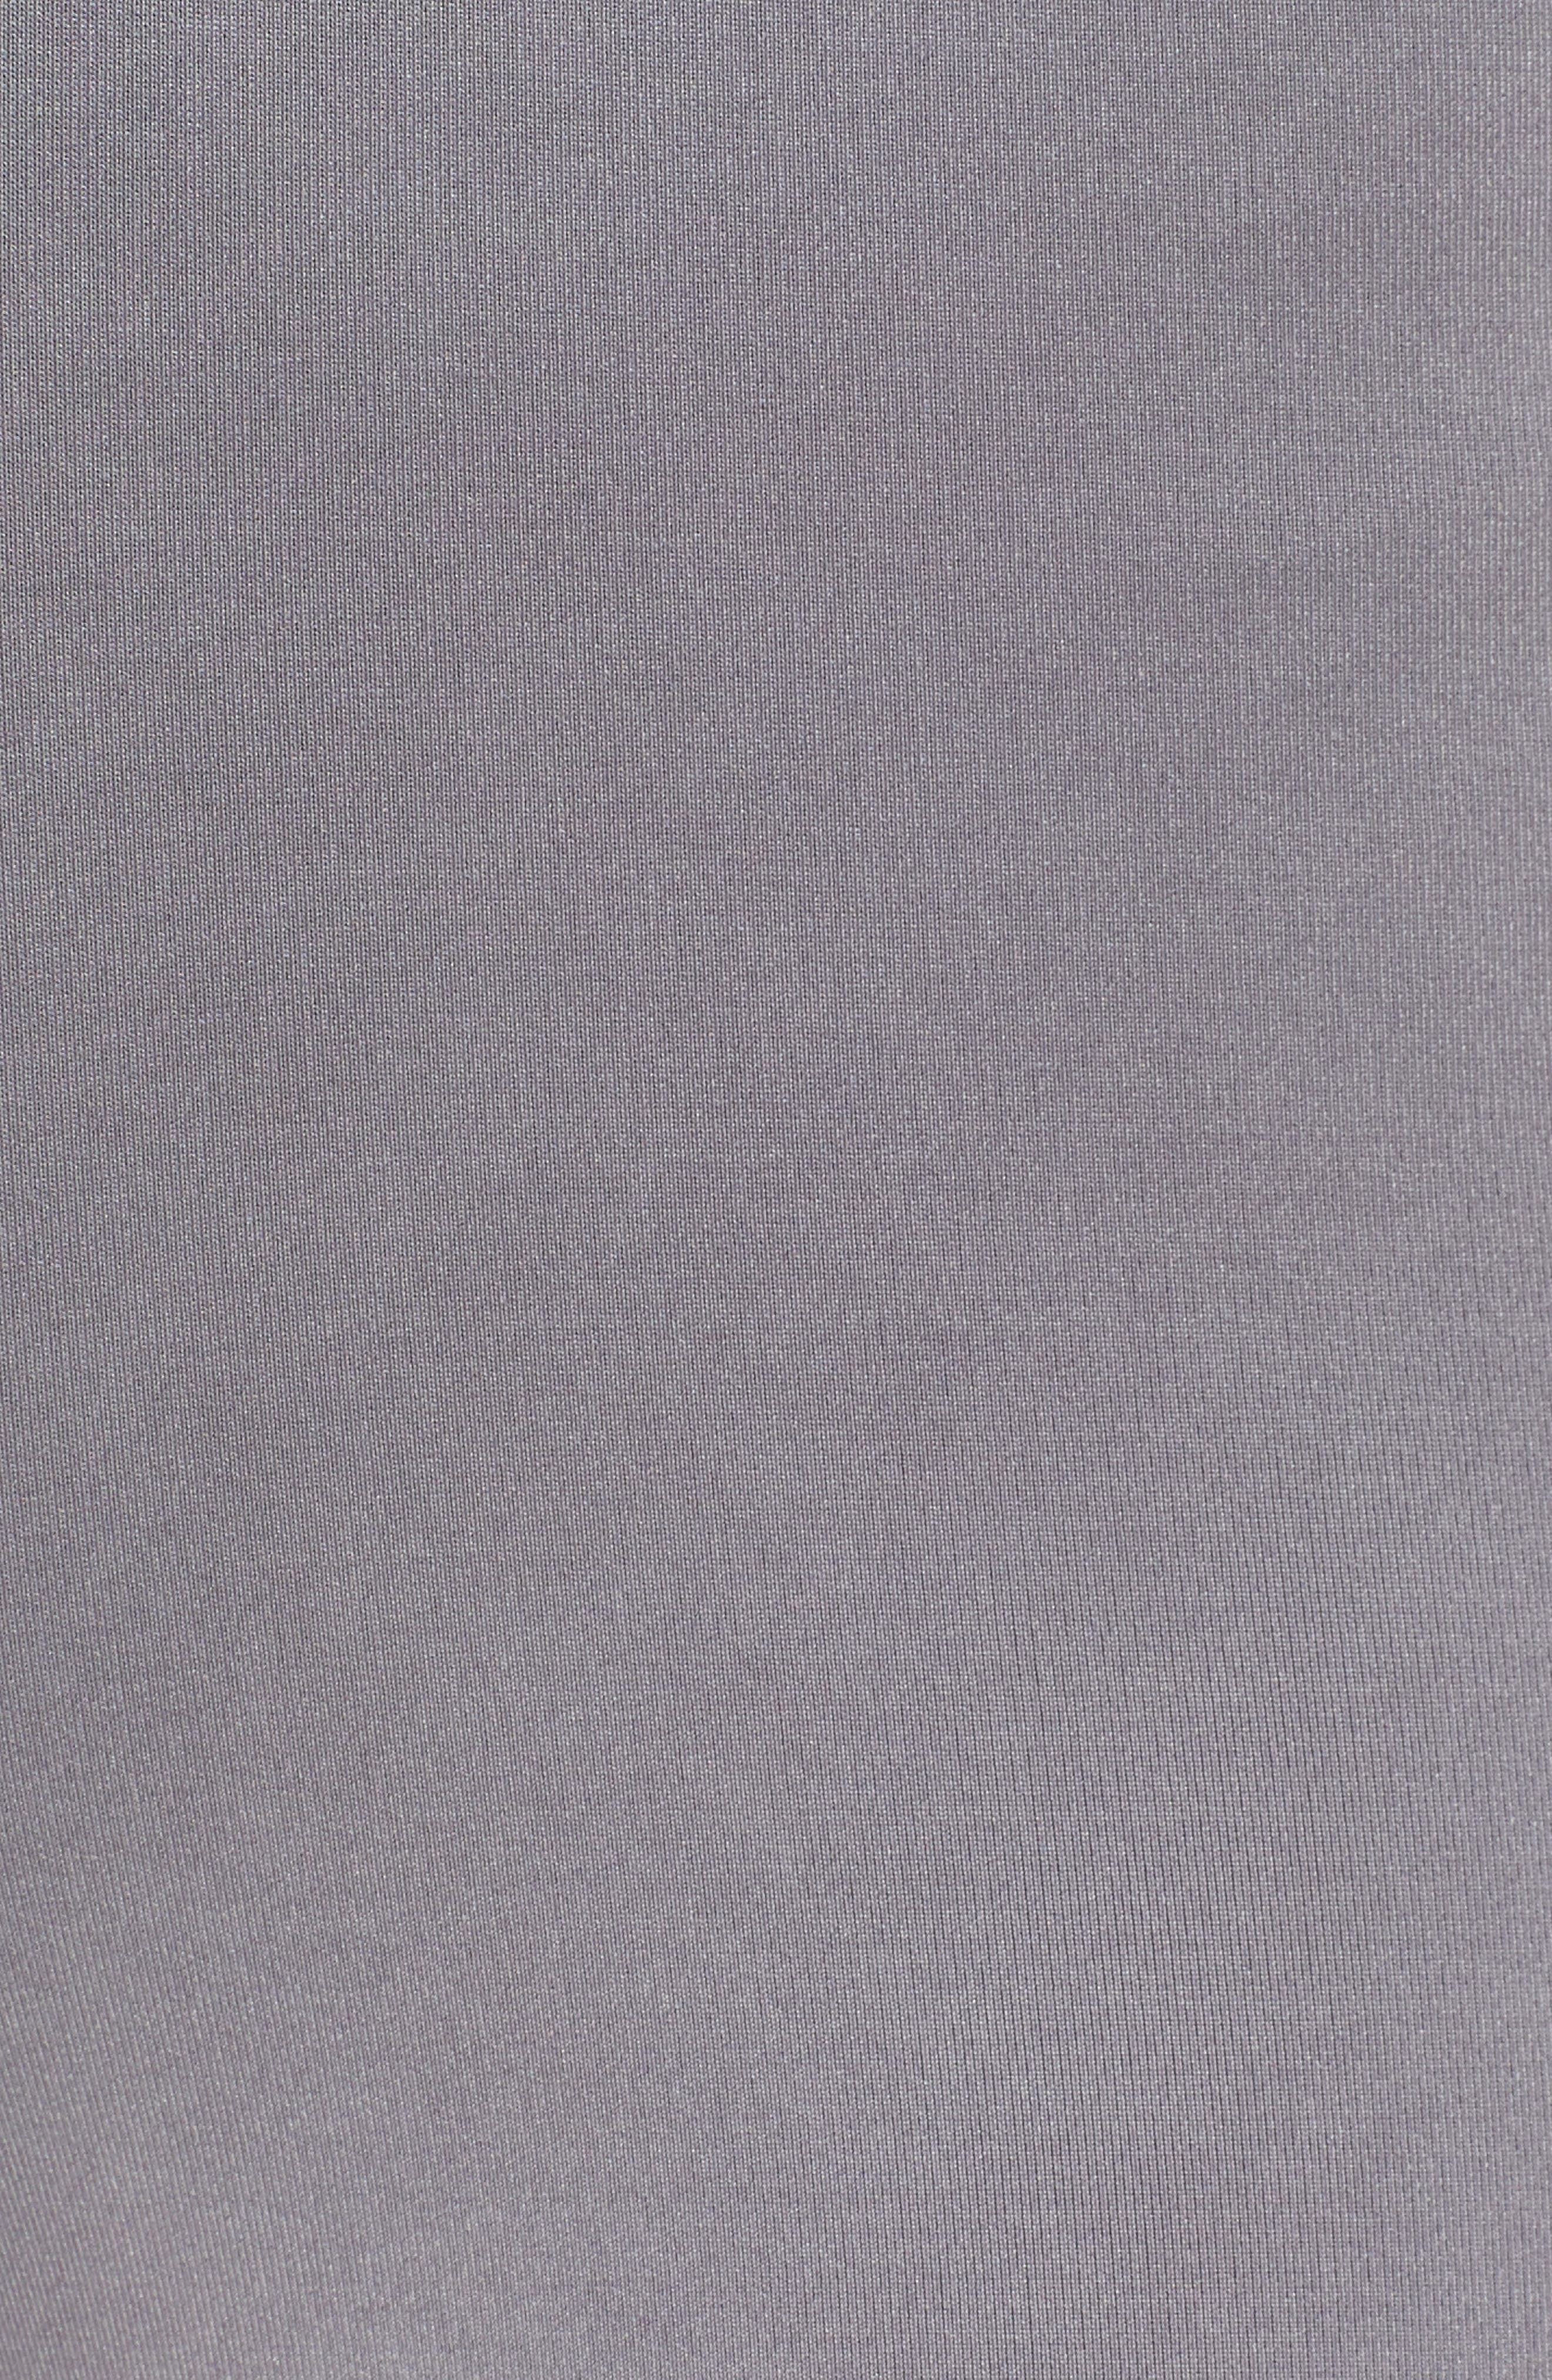 Pro Vintage Shorts,                             Alternate thumbnail 6, color,                             Dark Grey/ White